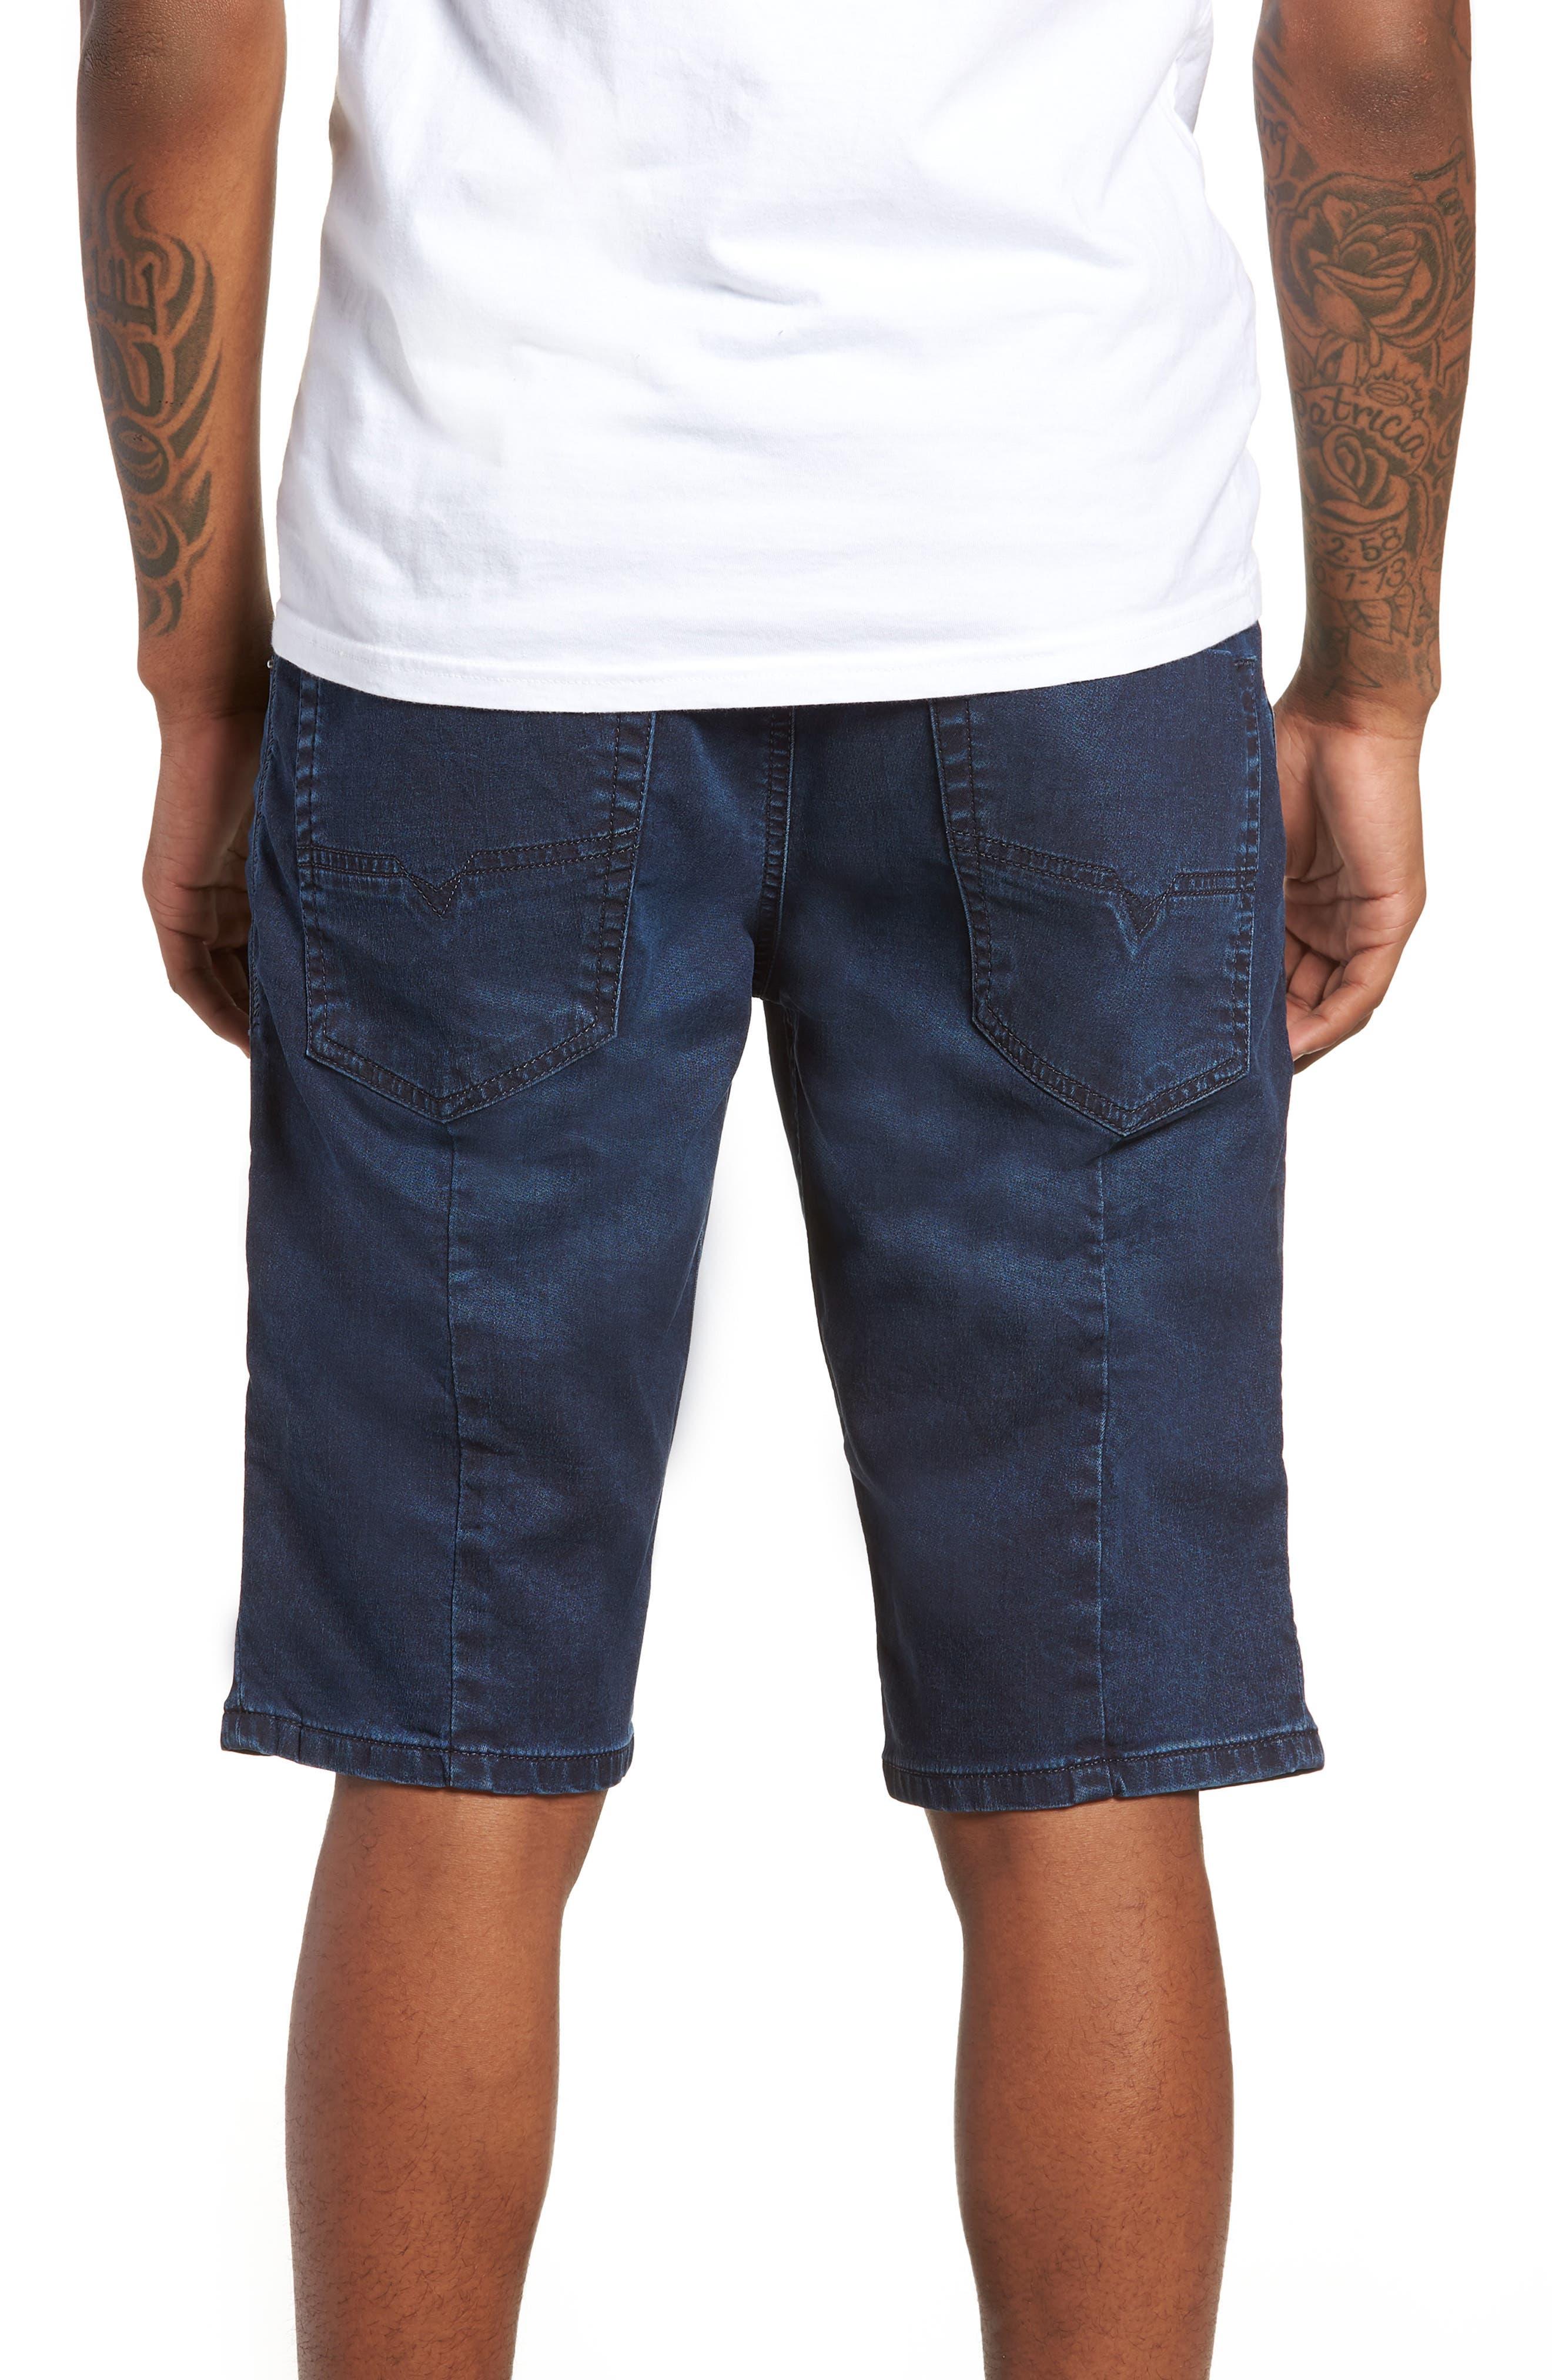 Krooshort Denim Shorts,                             Alternate thumbnail 2, color,                             0699C